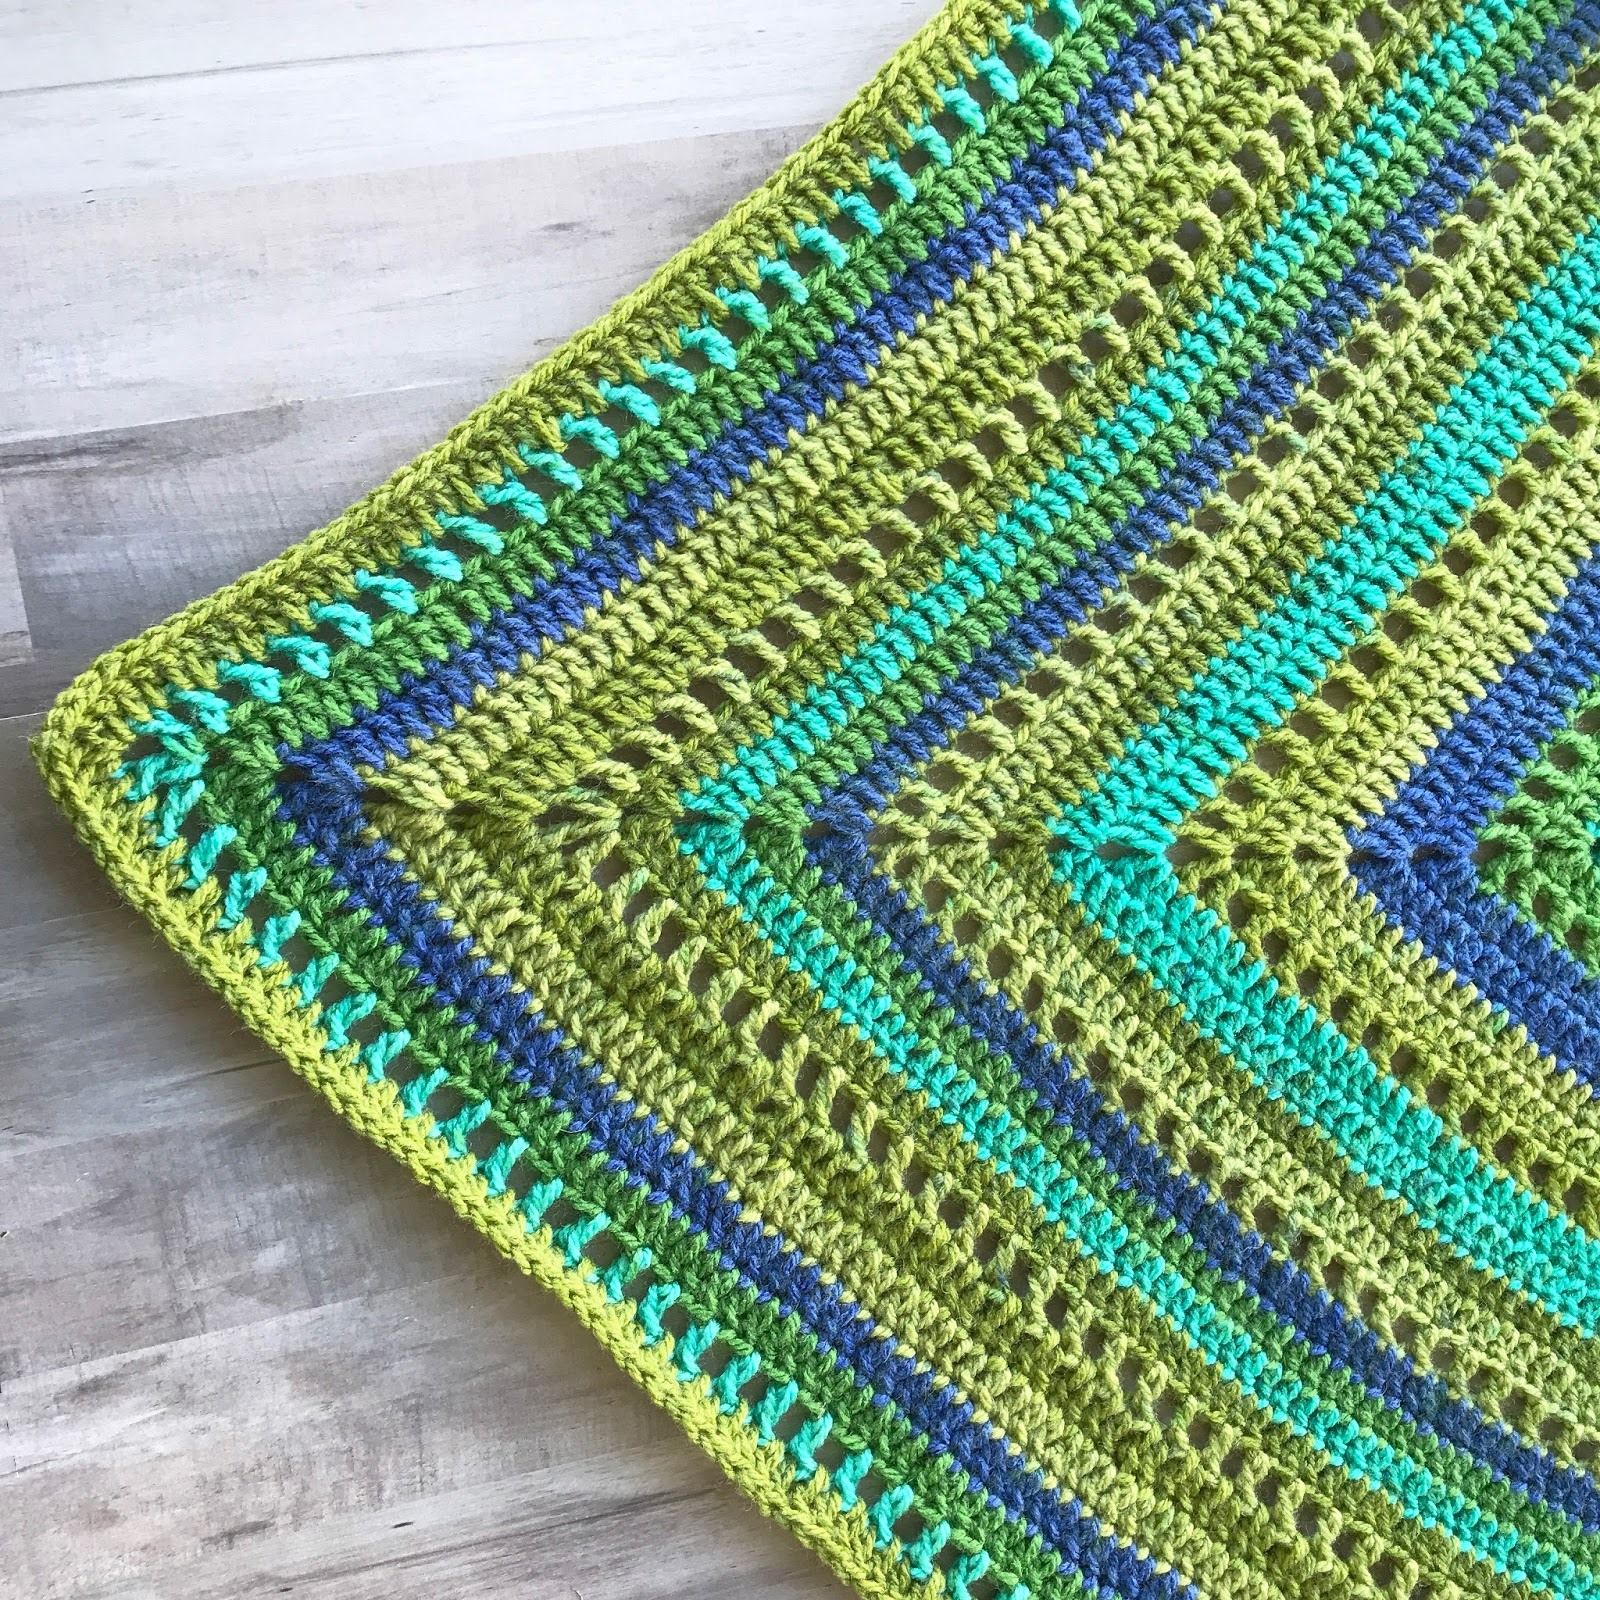 Granny Filet Square Afghan Crochet Pattern Marias Blue Crayon